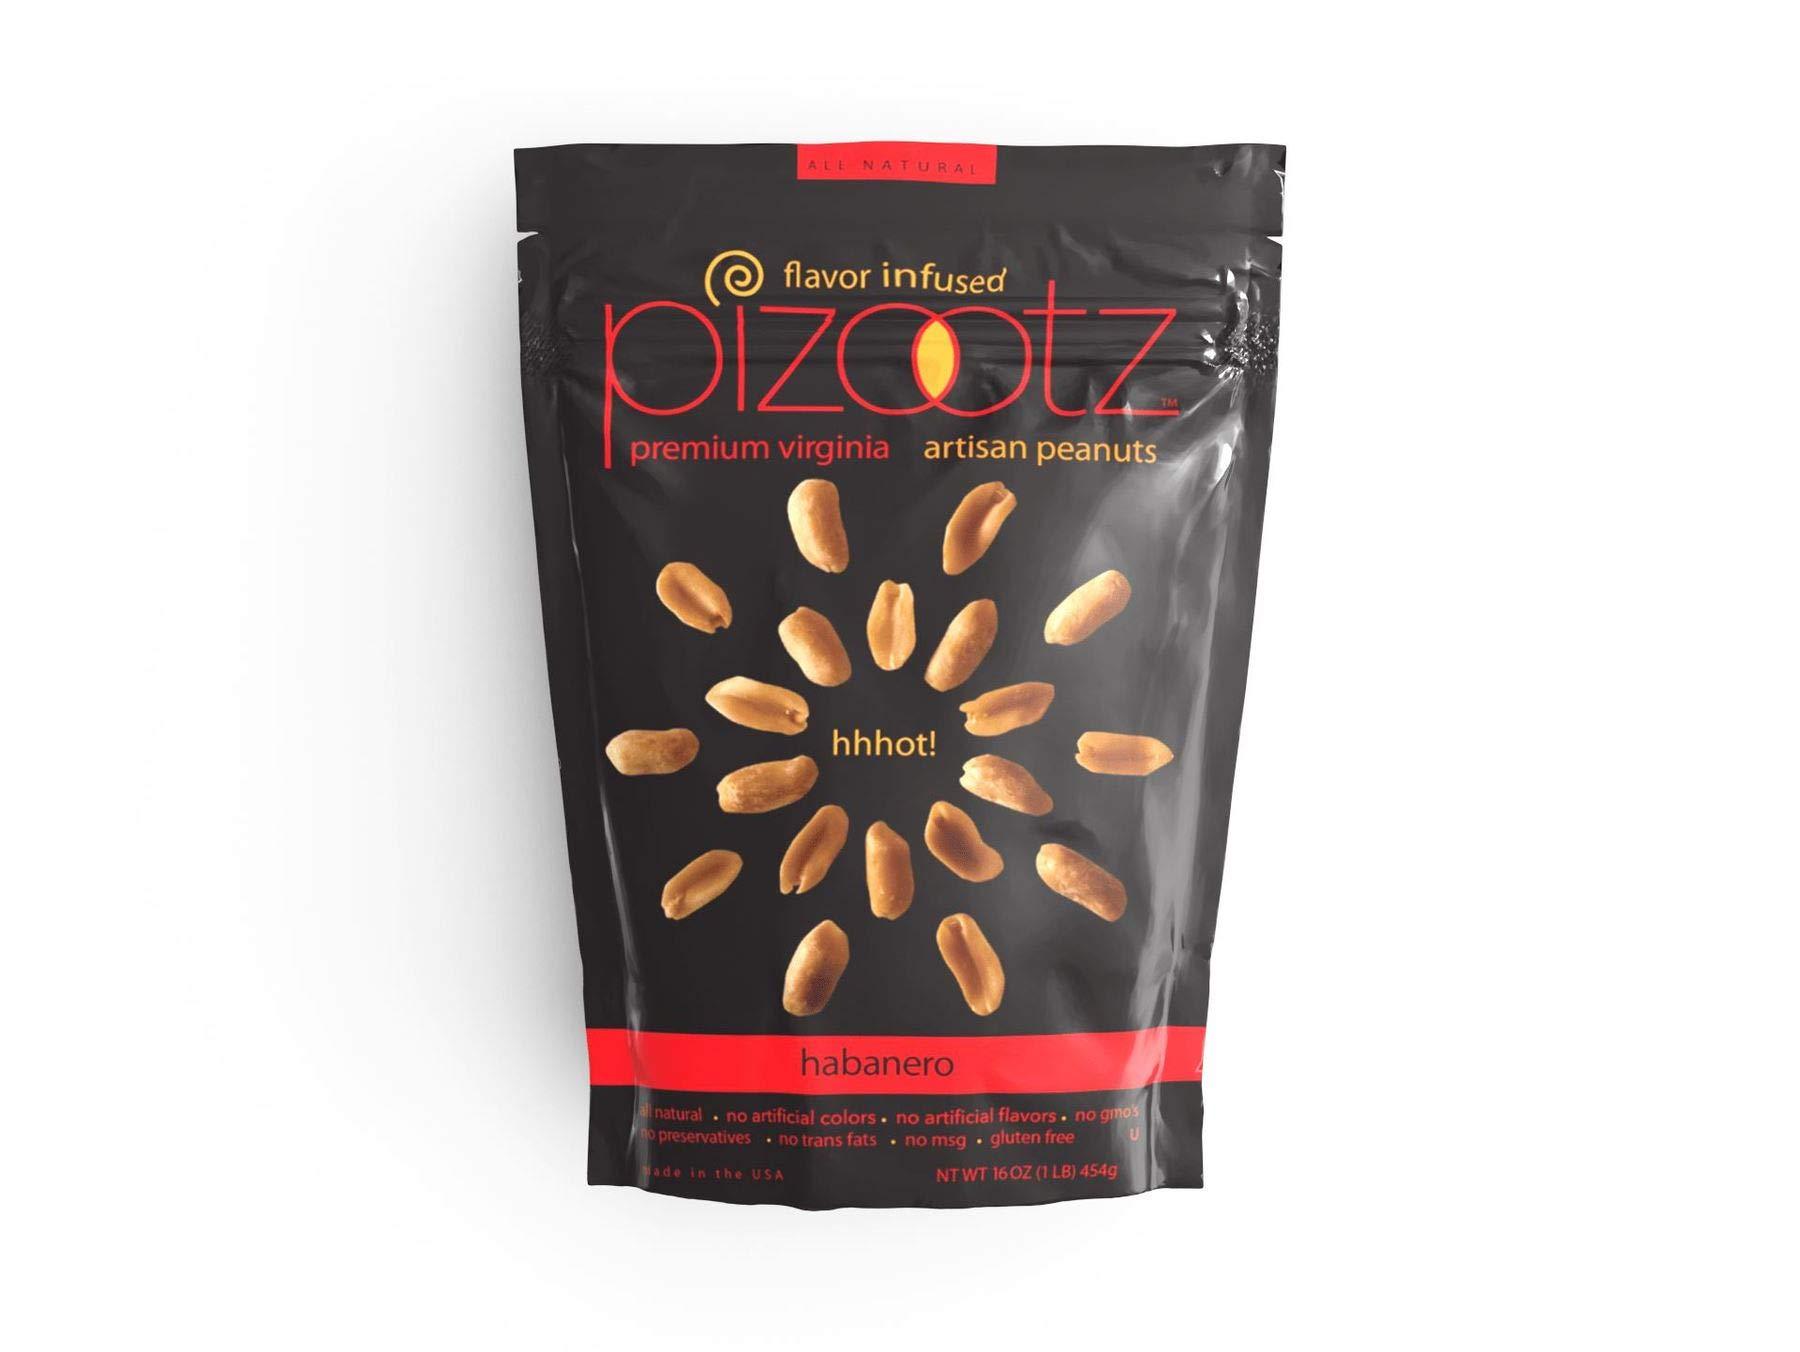 PIZOOTZ Habanero Flavor Infused Peanuts, Premium Virginia Gourmet, 5.75 Ounce